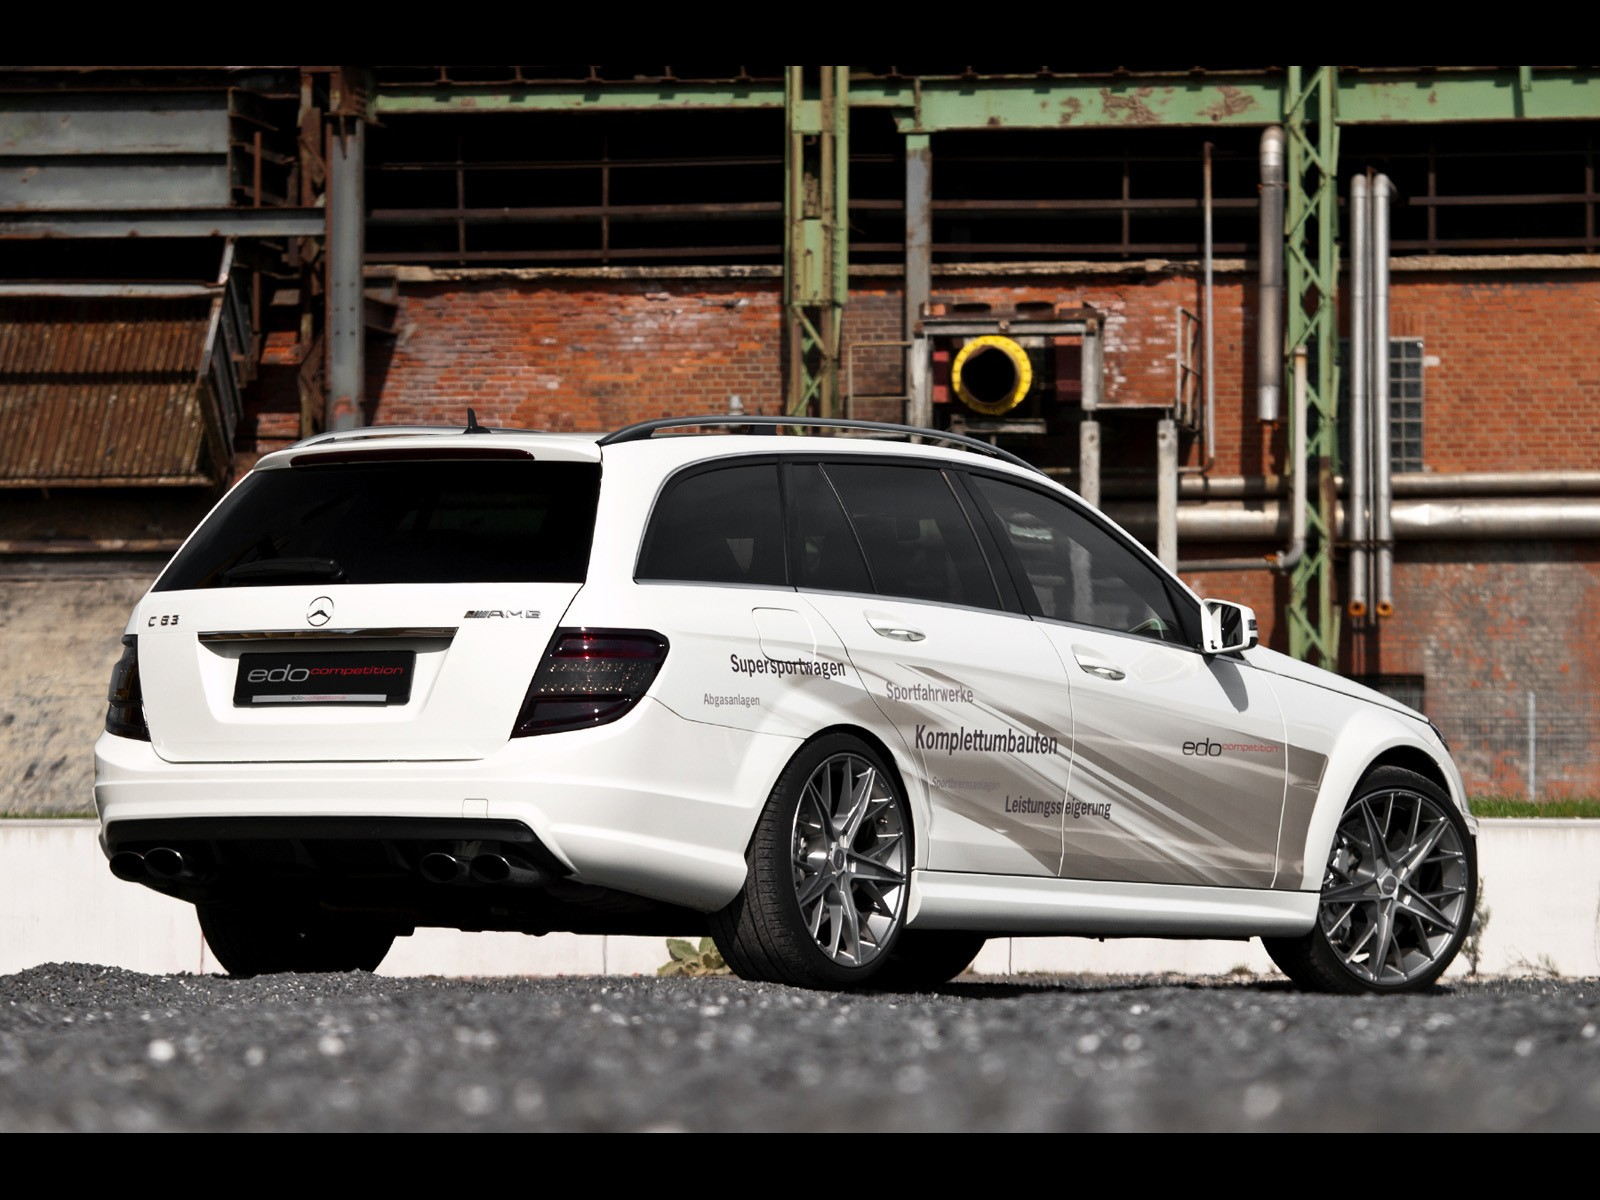 2012 Edo Competition - Mercedes C63 AMG T-Model